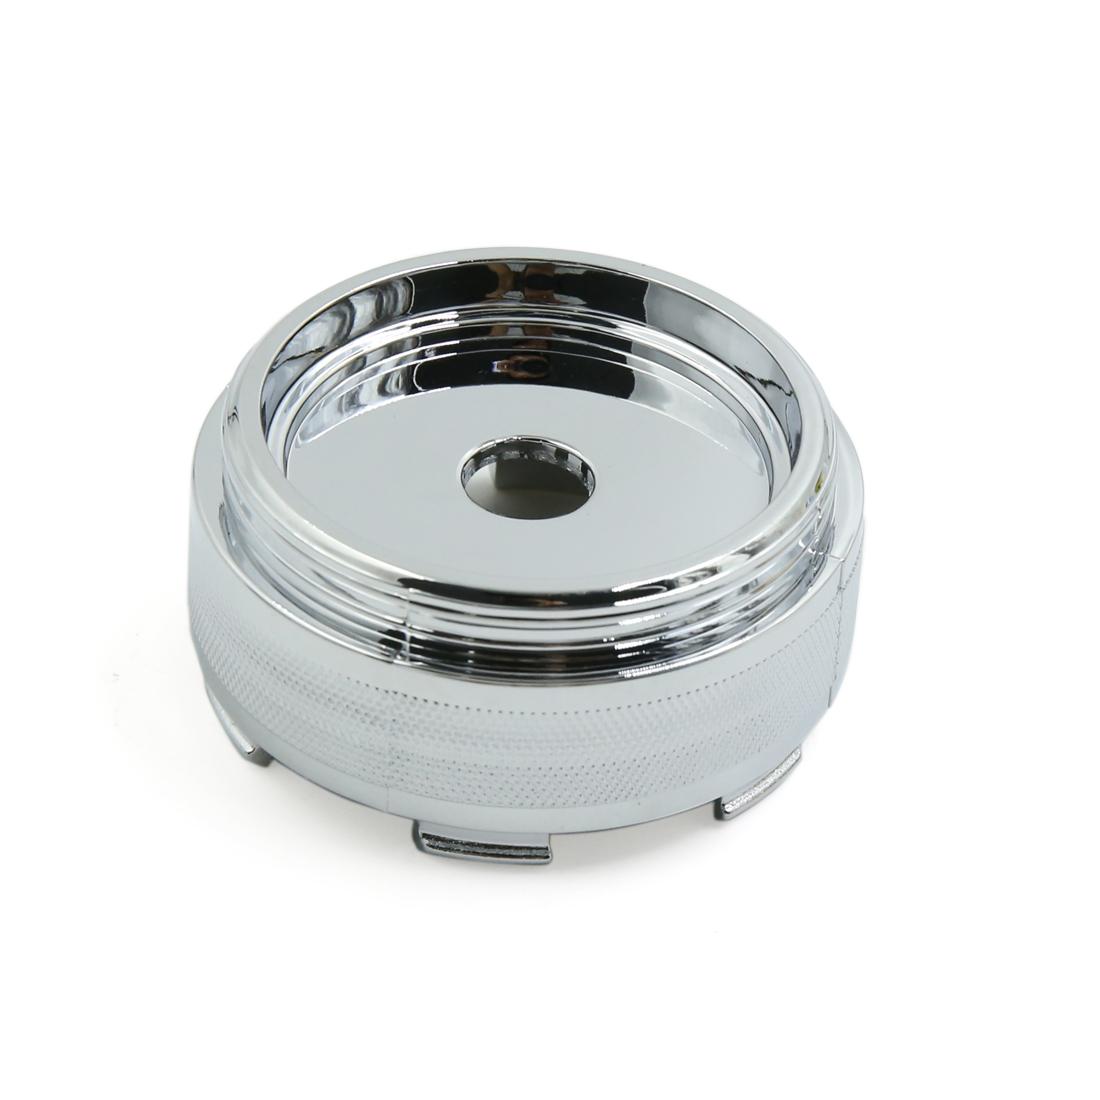 61mm Dia 6 Lugs Silver Tone Plastic Tyre Wheel Center Hub Cap Cover for Car